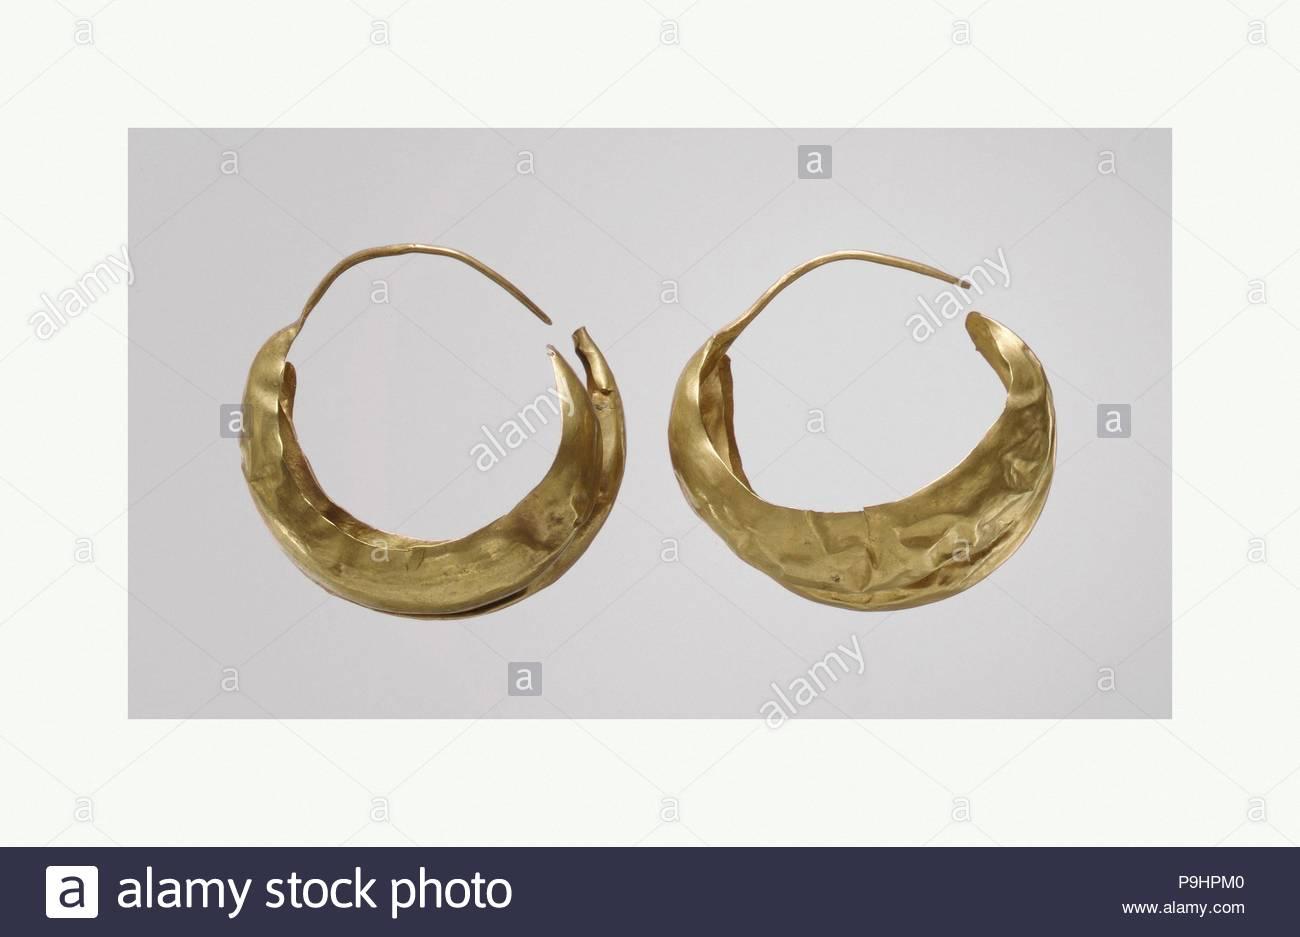 Earring Early Dynastic IIIa Ca 2600 2500 BC Mesopotamia Ur Modern Tell Al Muqayyar Sumerian Gold 2 3 4 In 7 Cm Metalwork Ornaments